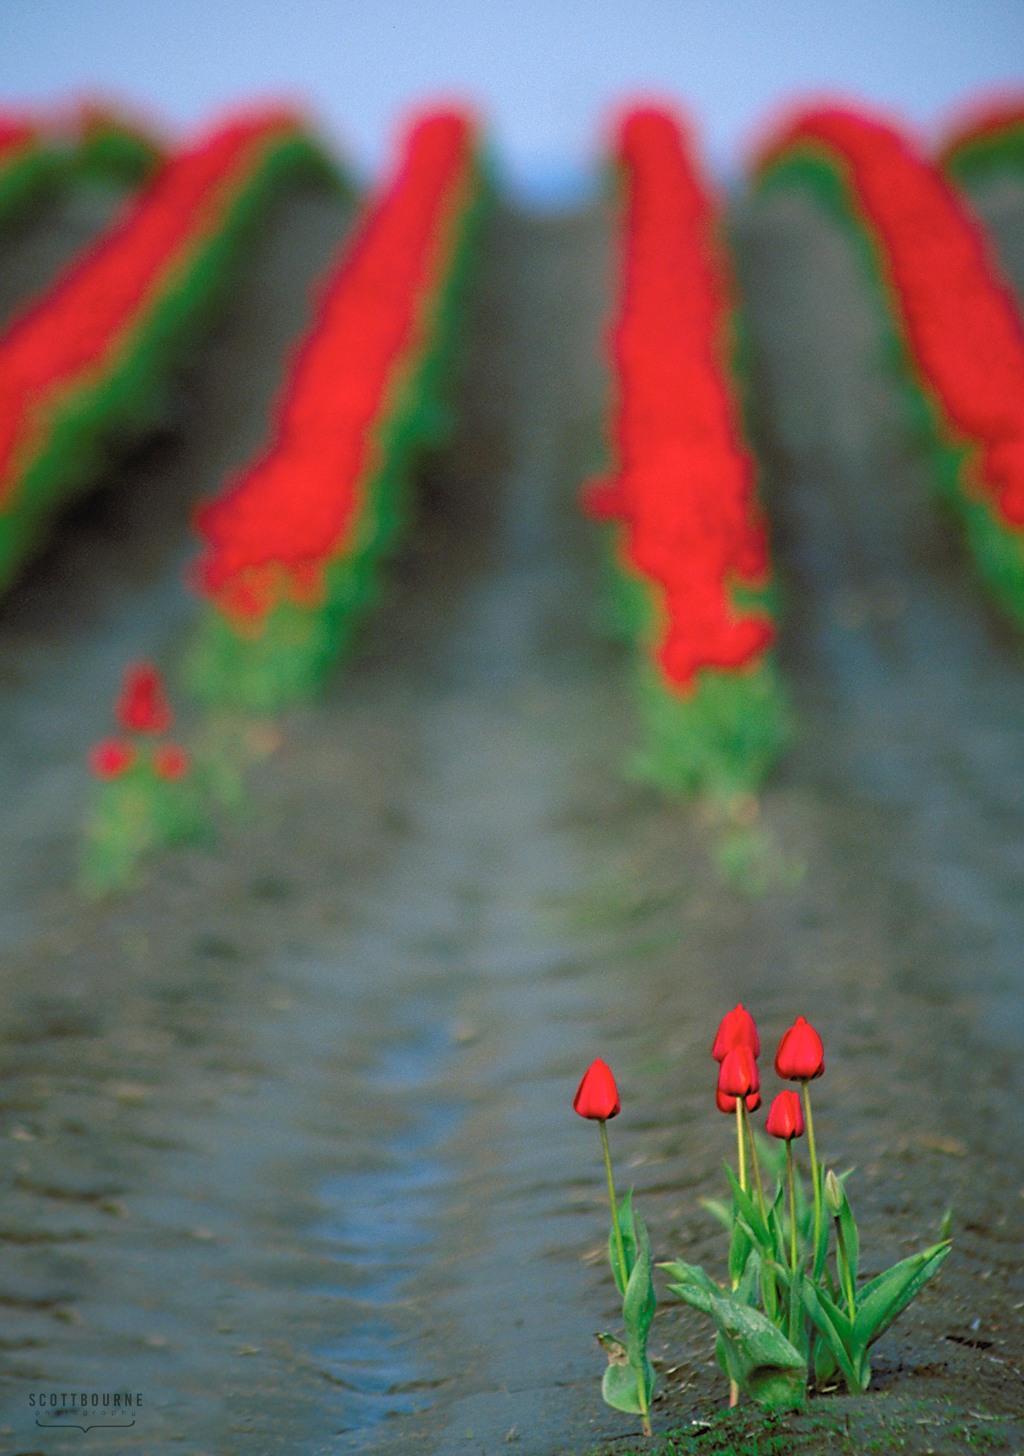 Tulip Photo by Scott Bourne